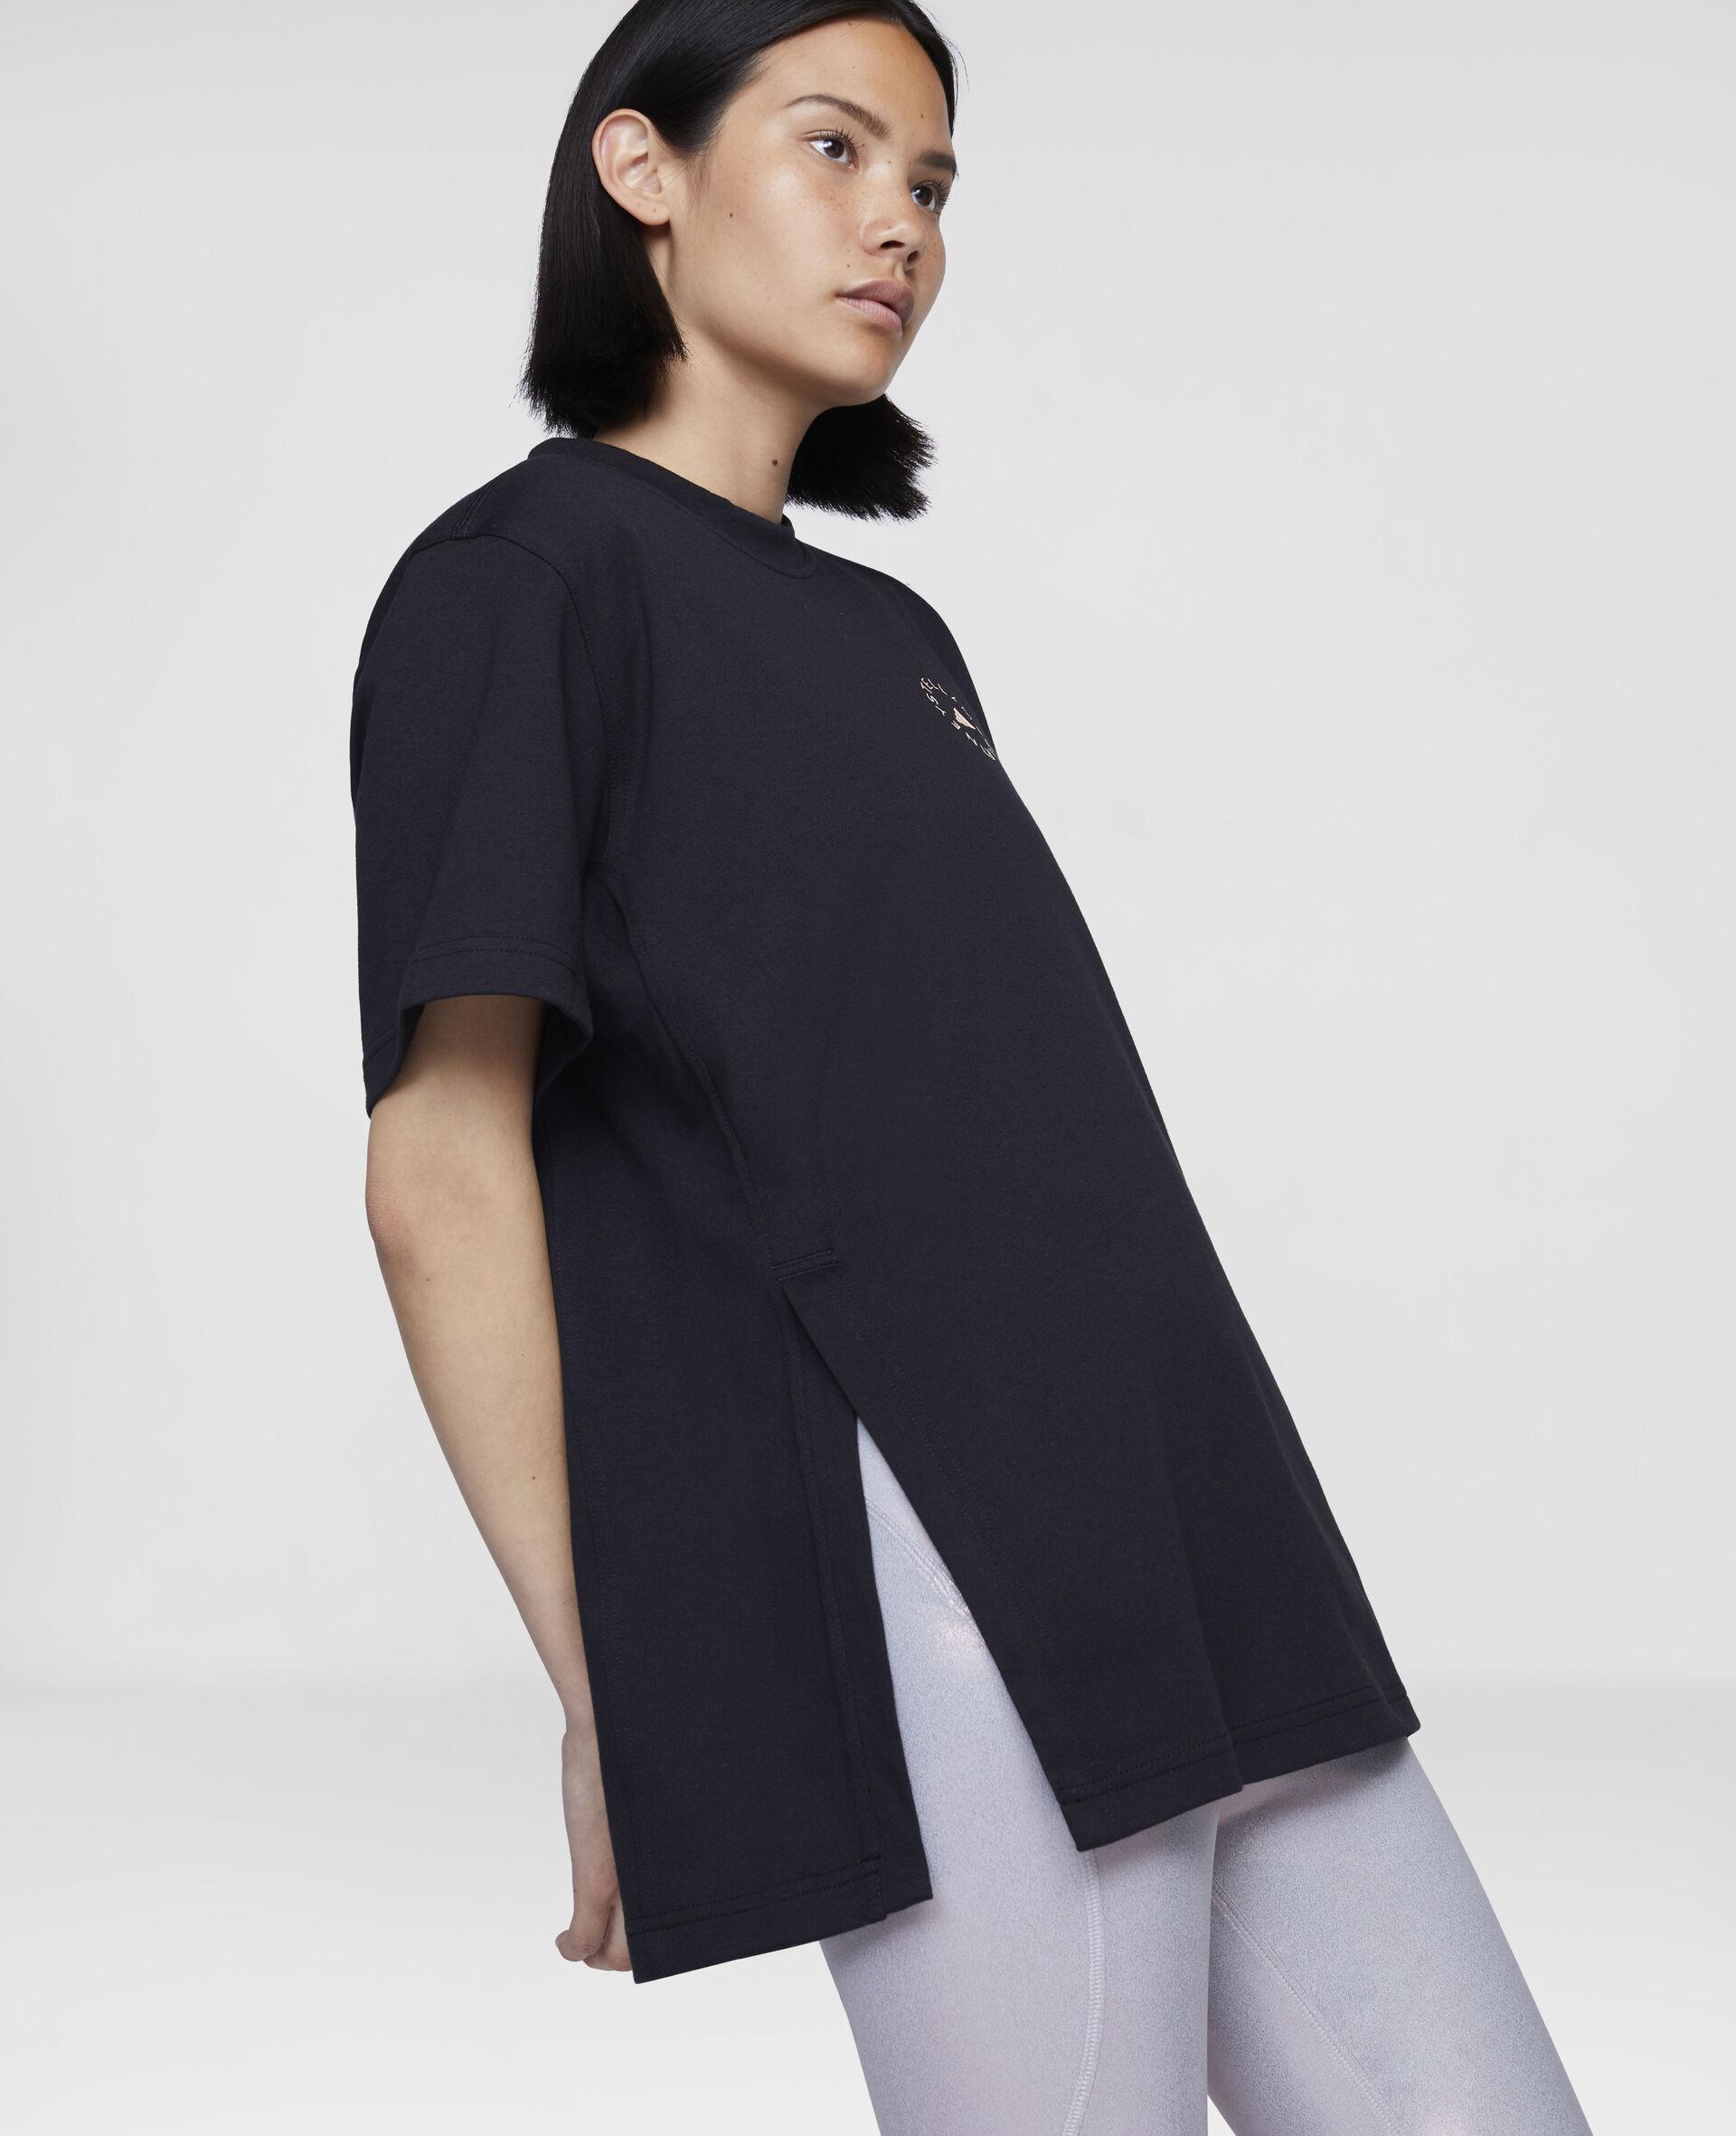 t-shirt d'entraînement noir-Noir-large image number 3